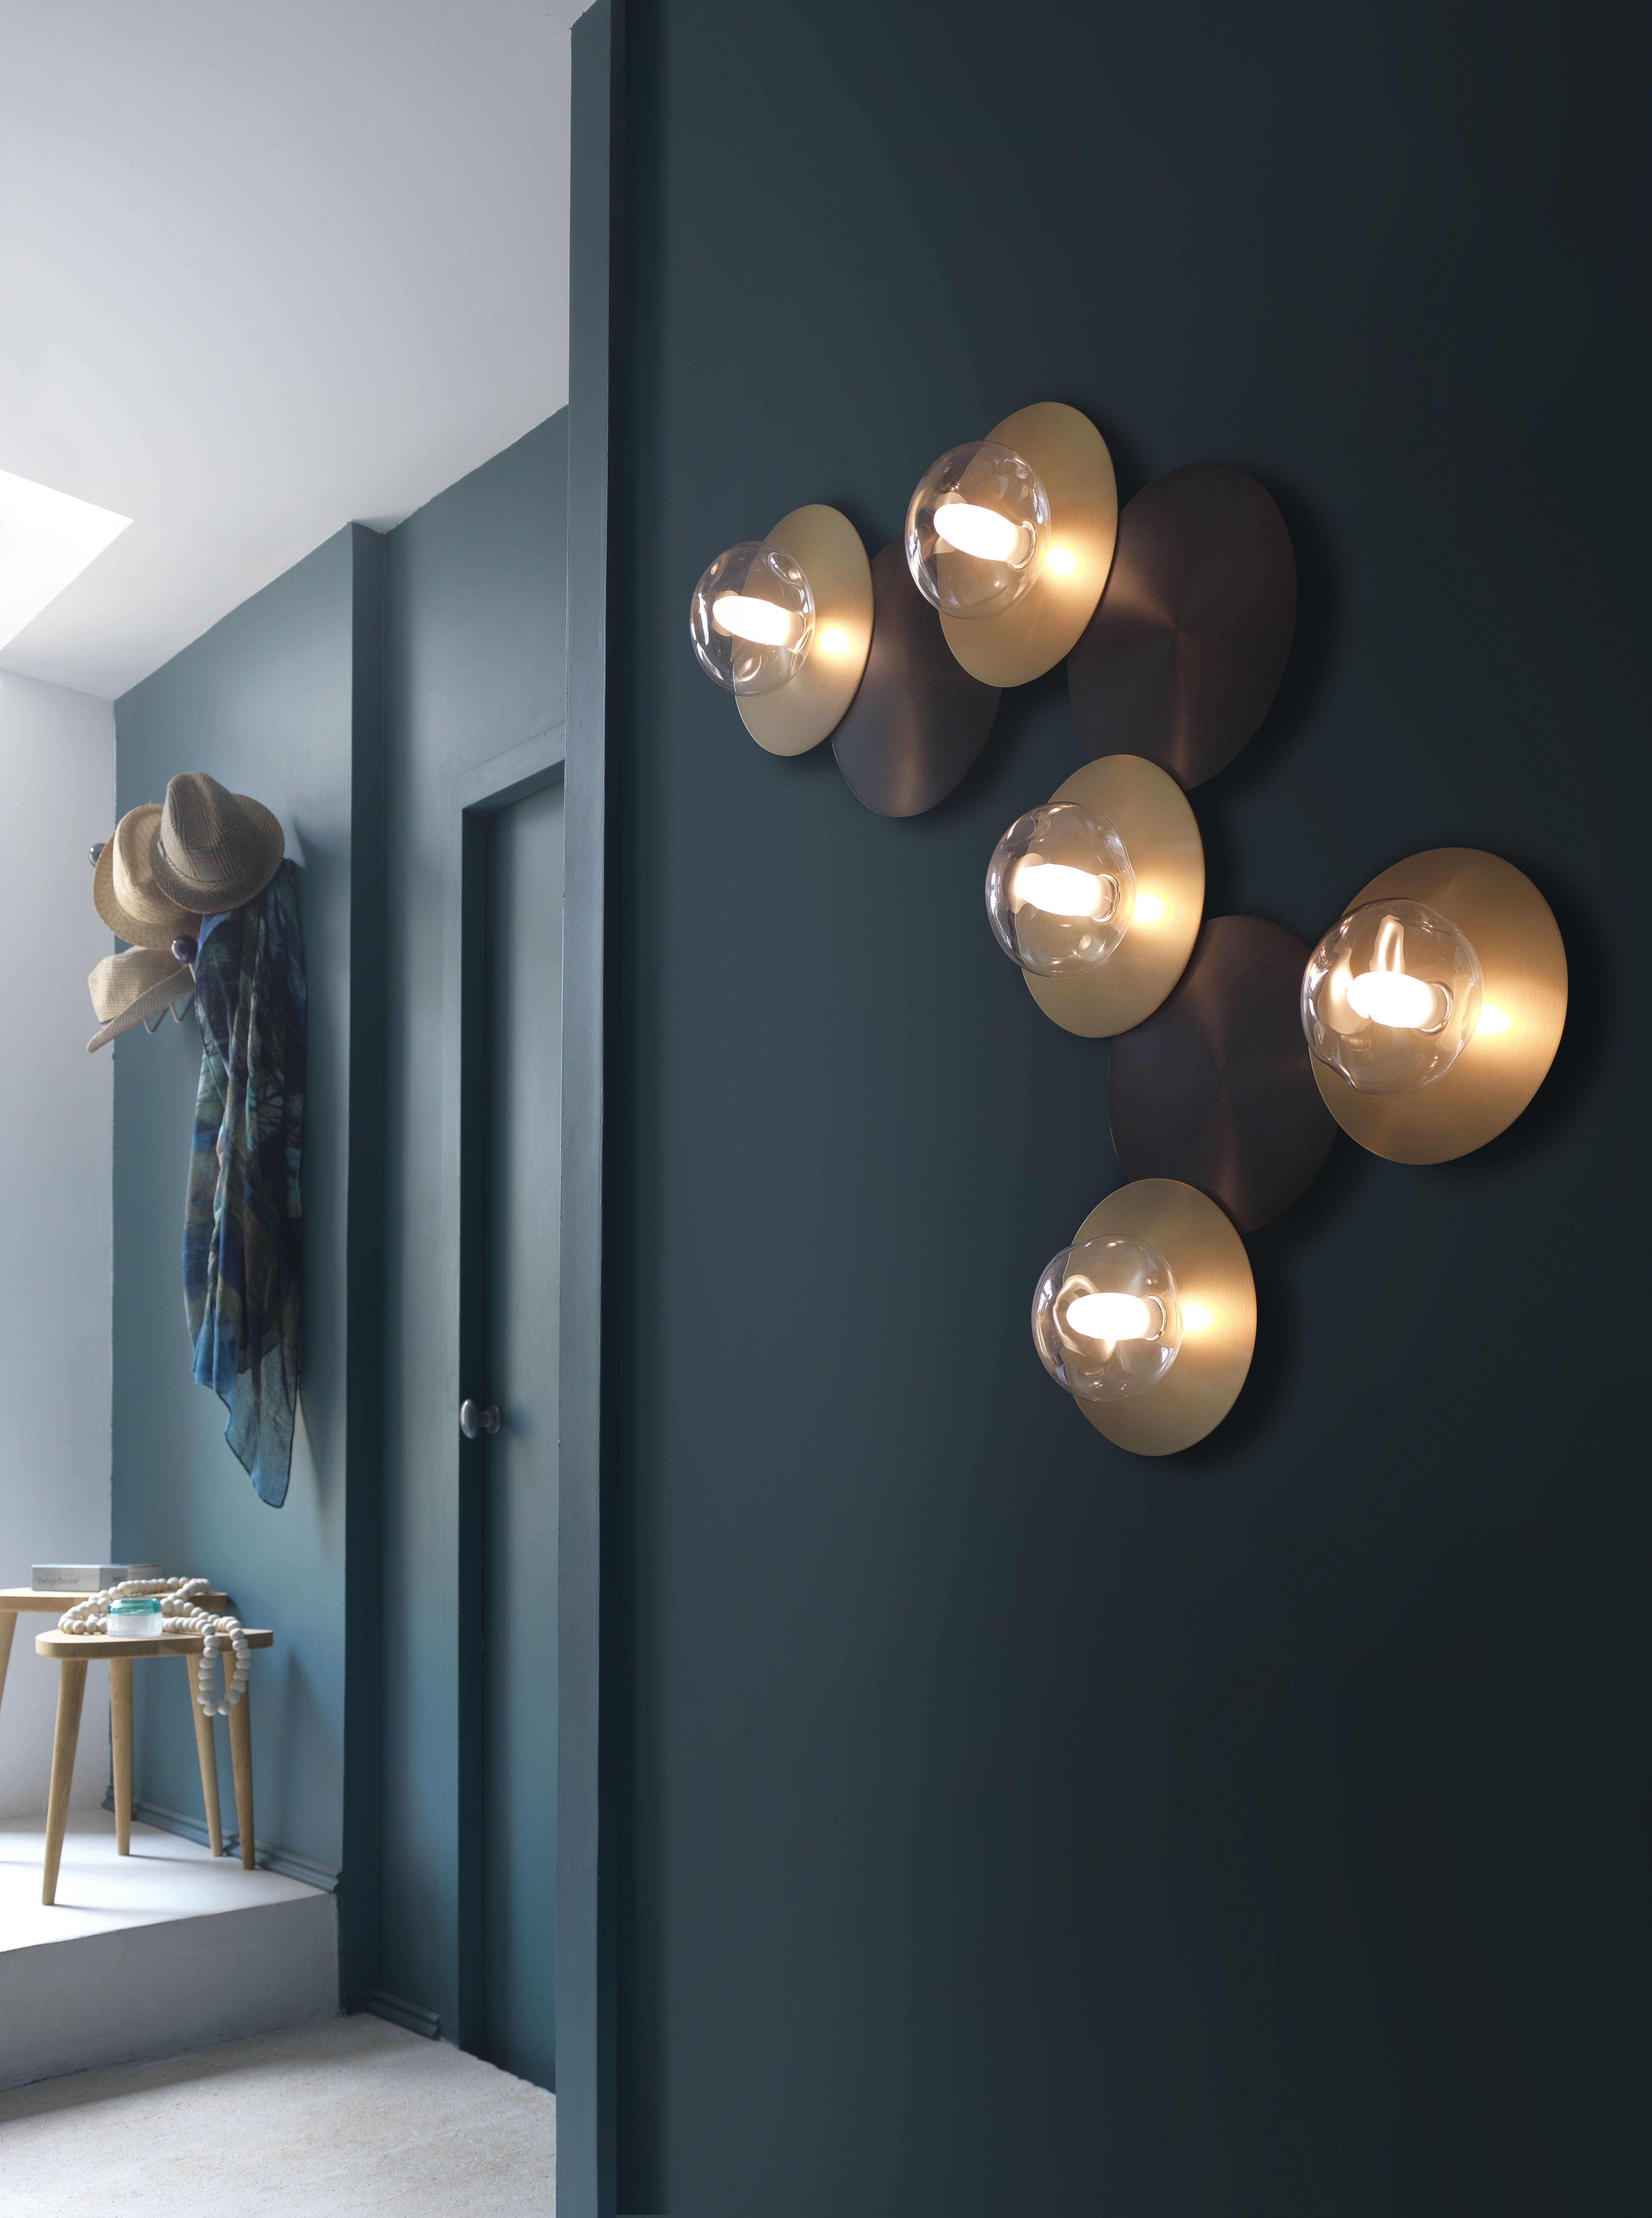 Applique Murale Cvl Luminaires Luminaire Cvl Photographie Pro